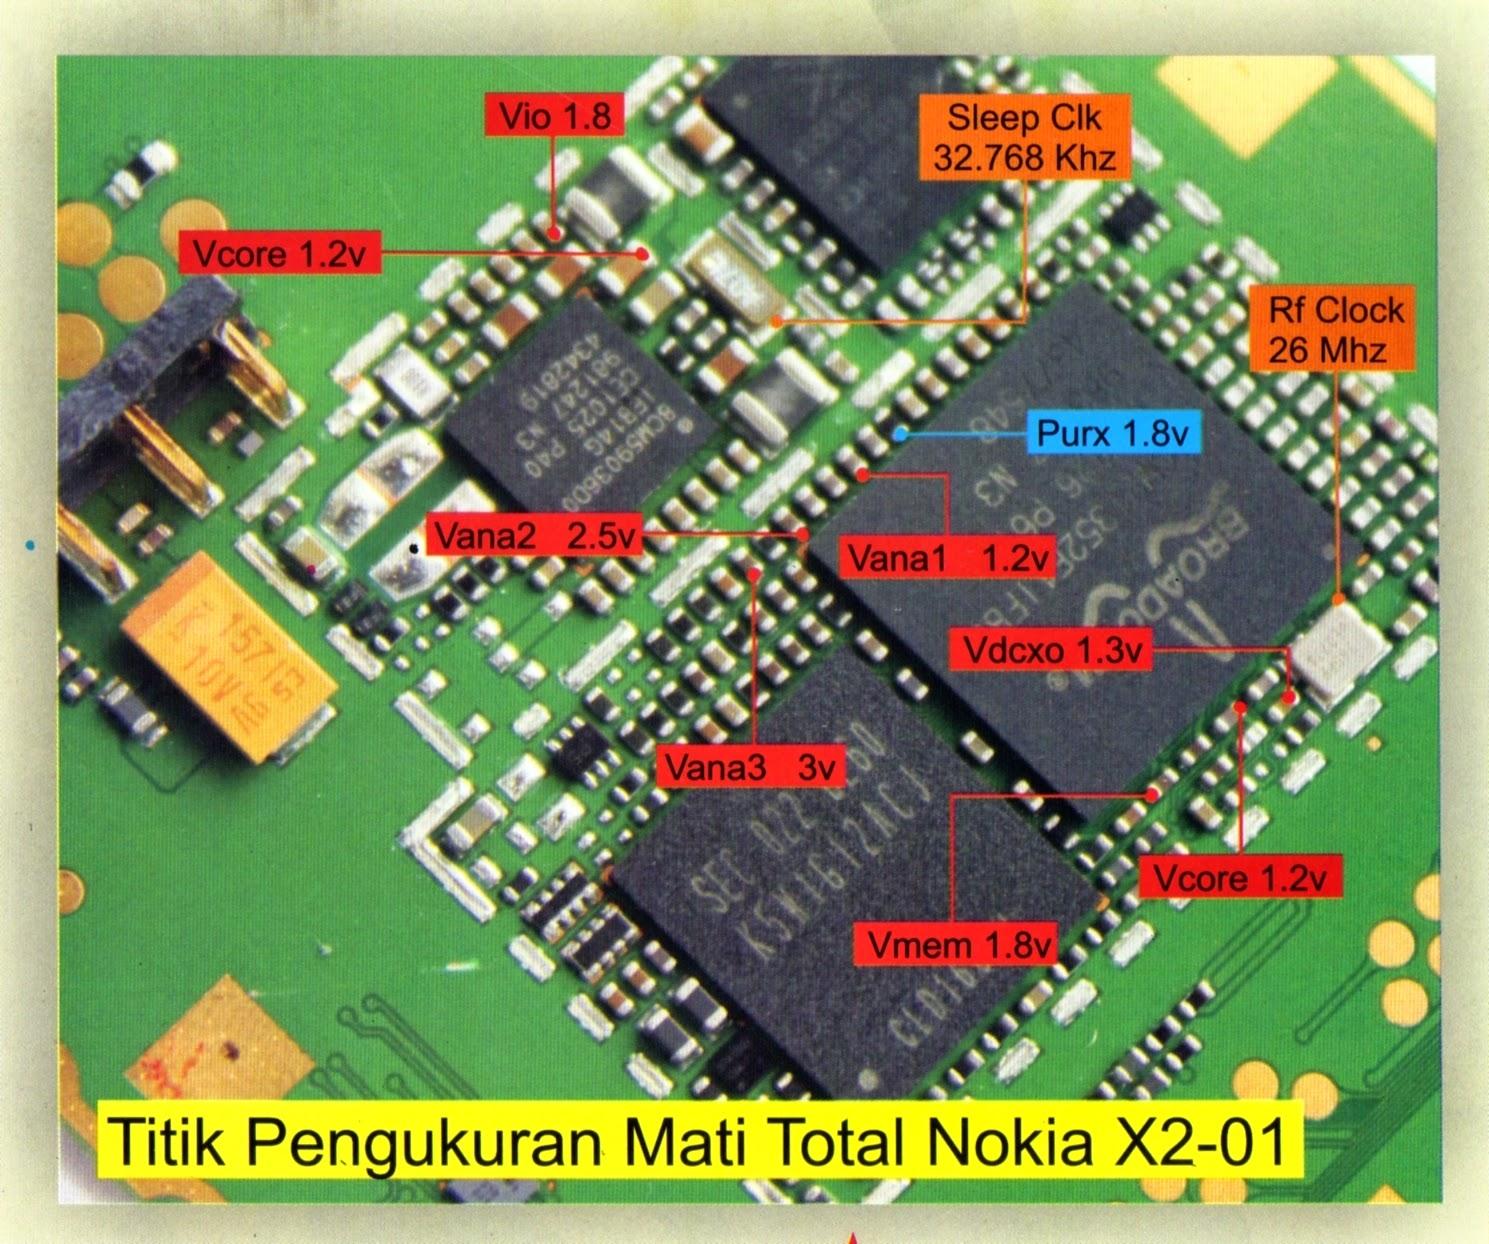 Google themes nokia x2-01 - Google Themes Nokia X2-01 54